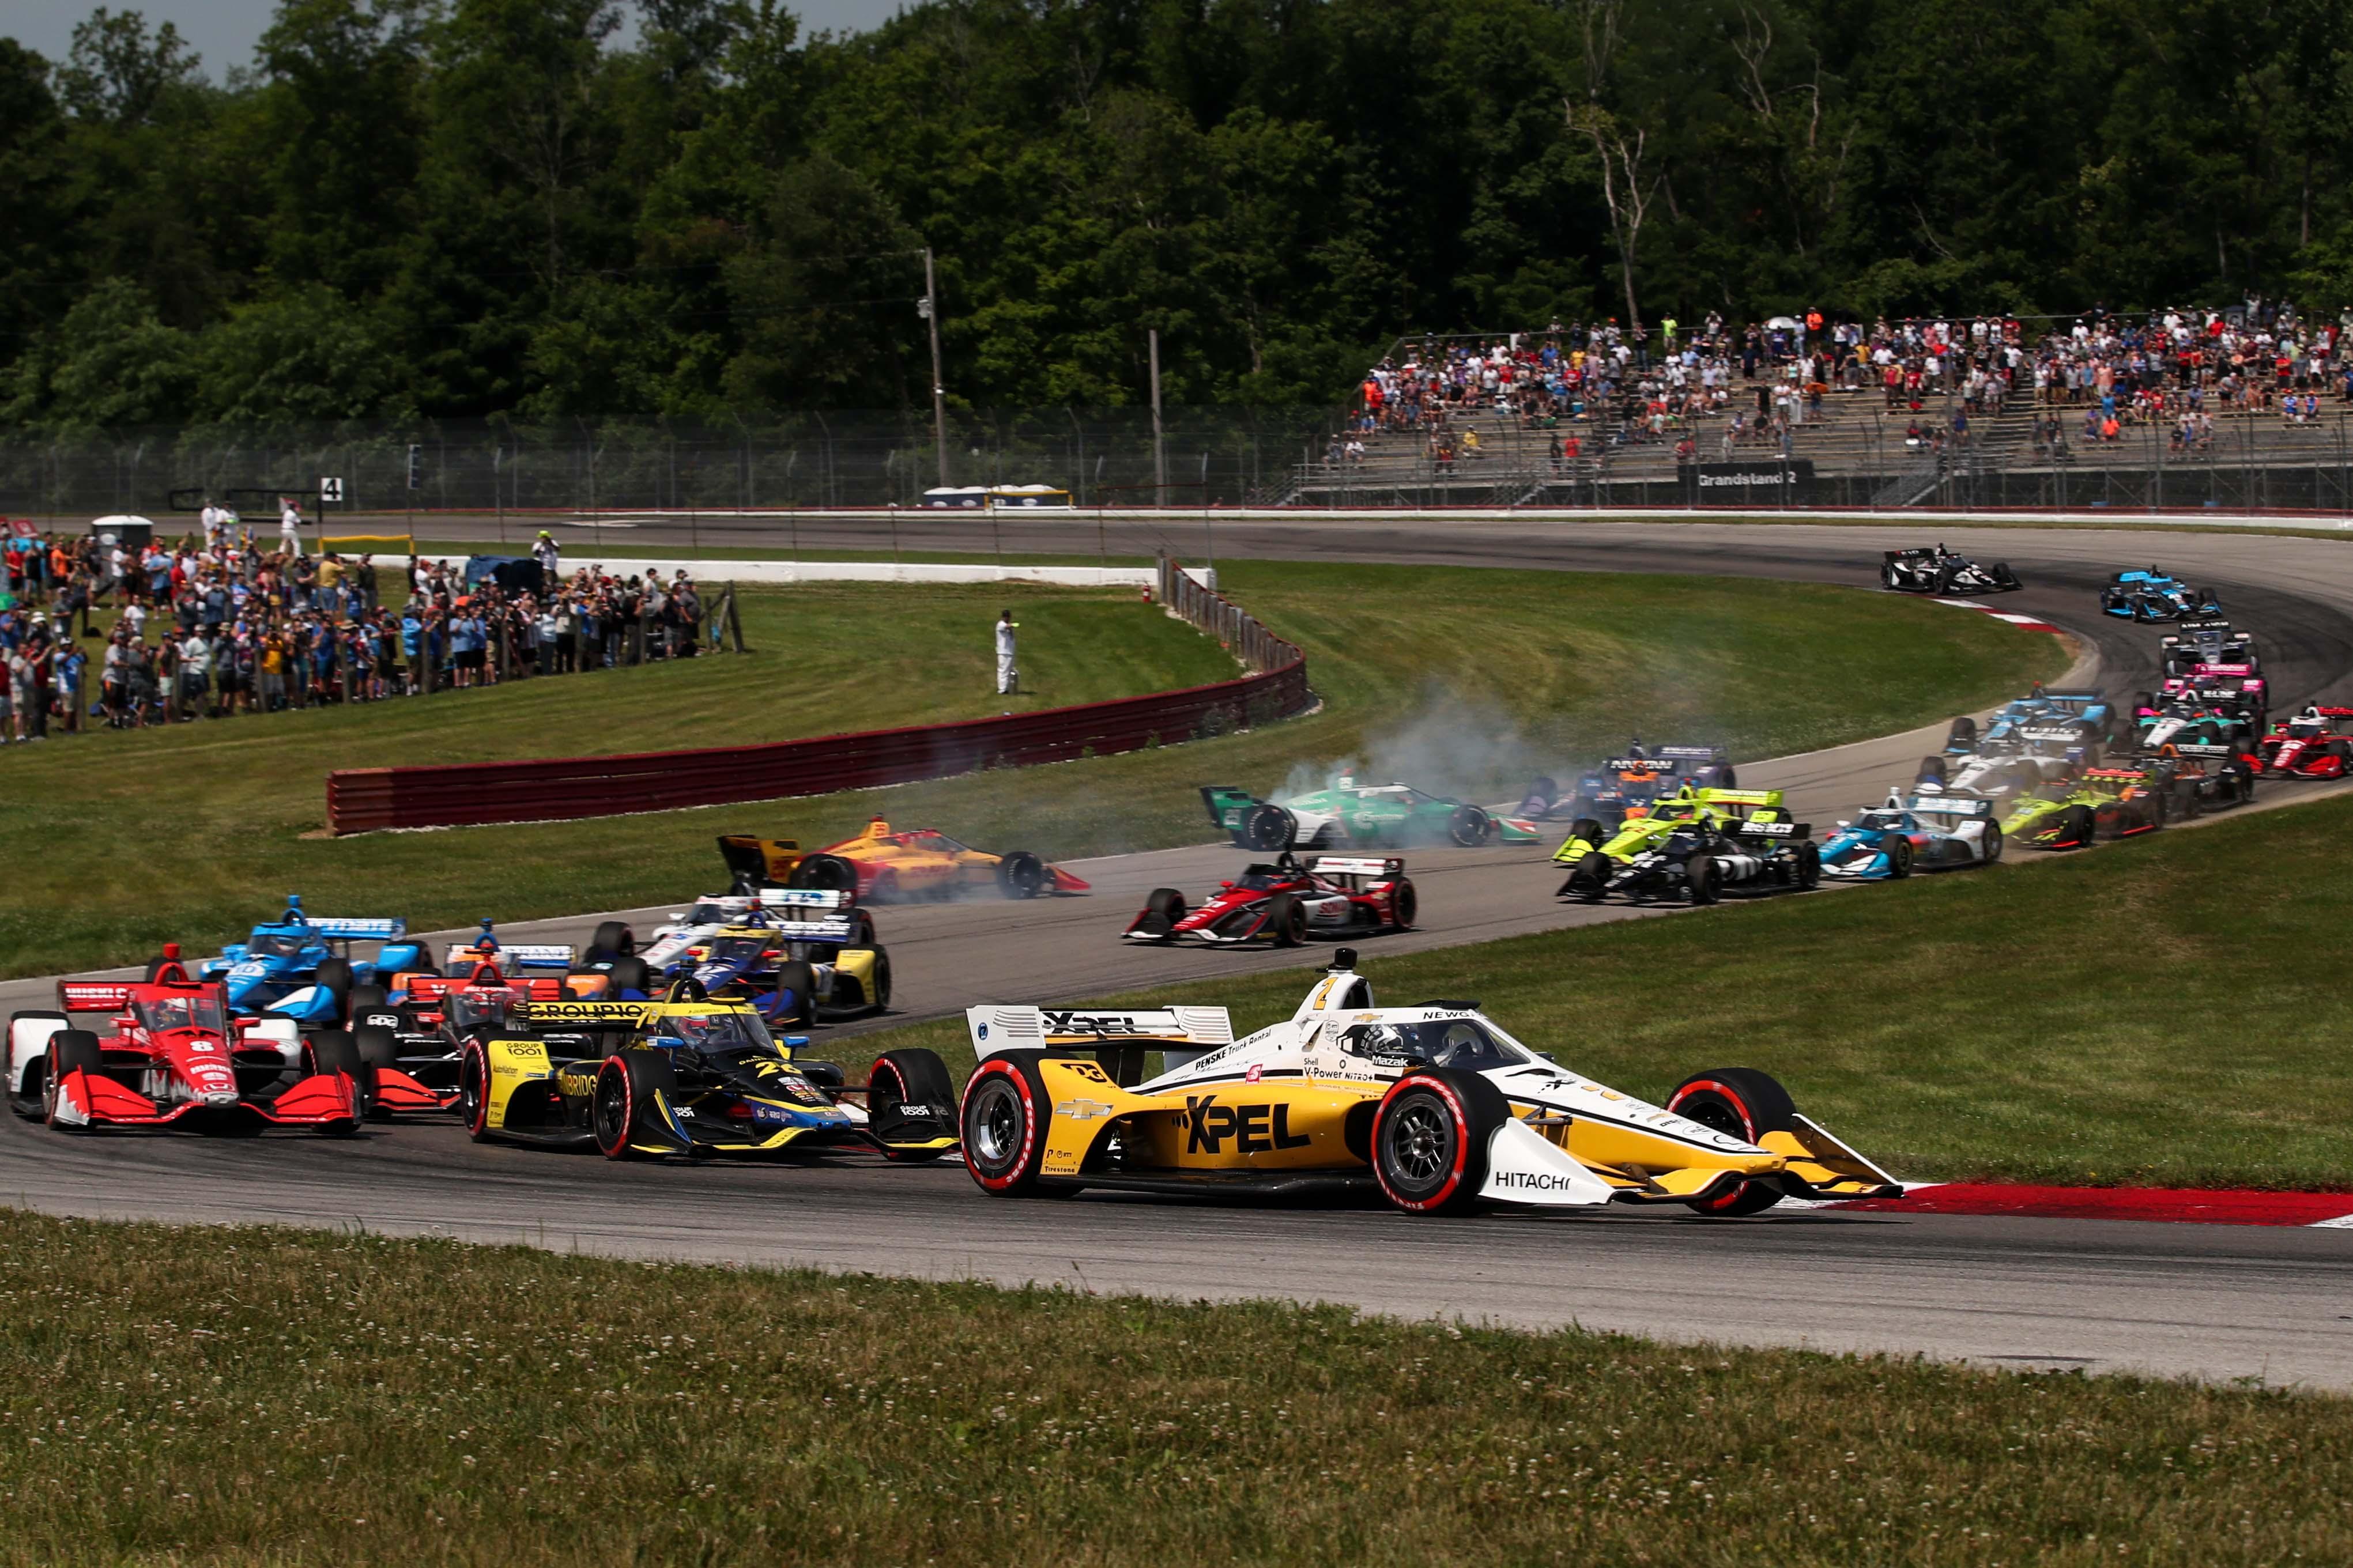 Josef Newgarden leads - Mid-Ohio - Indycar Series